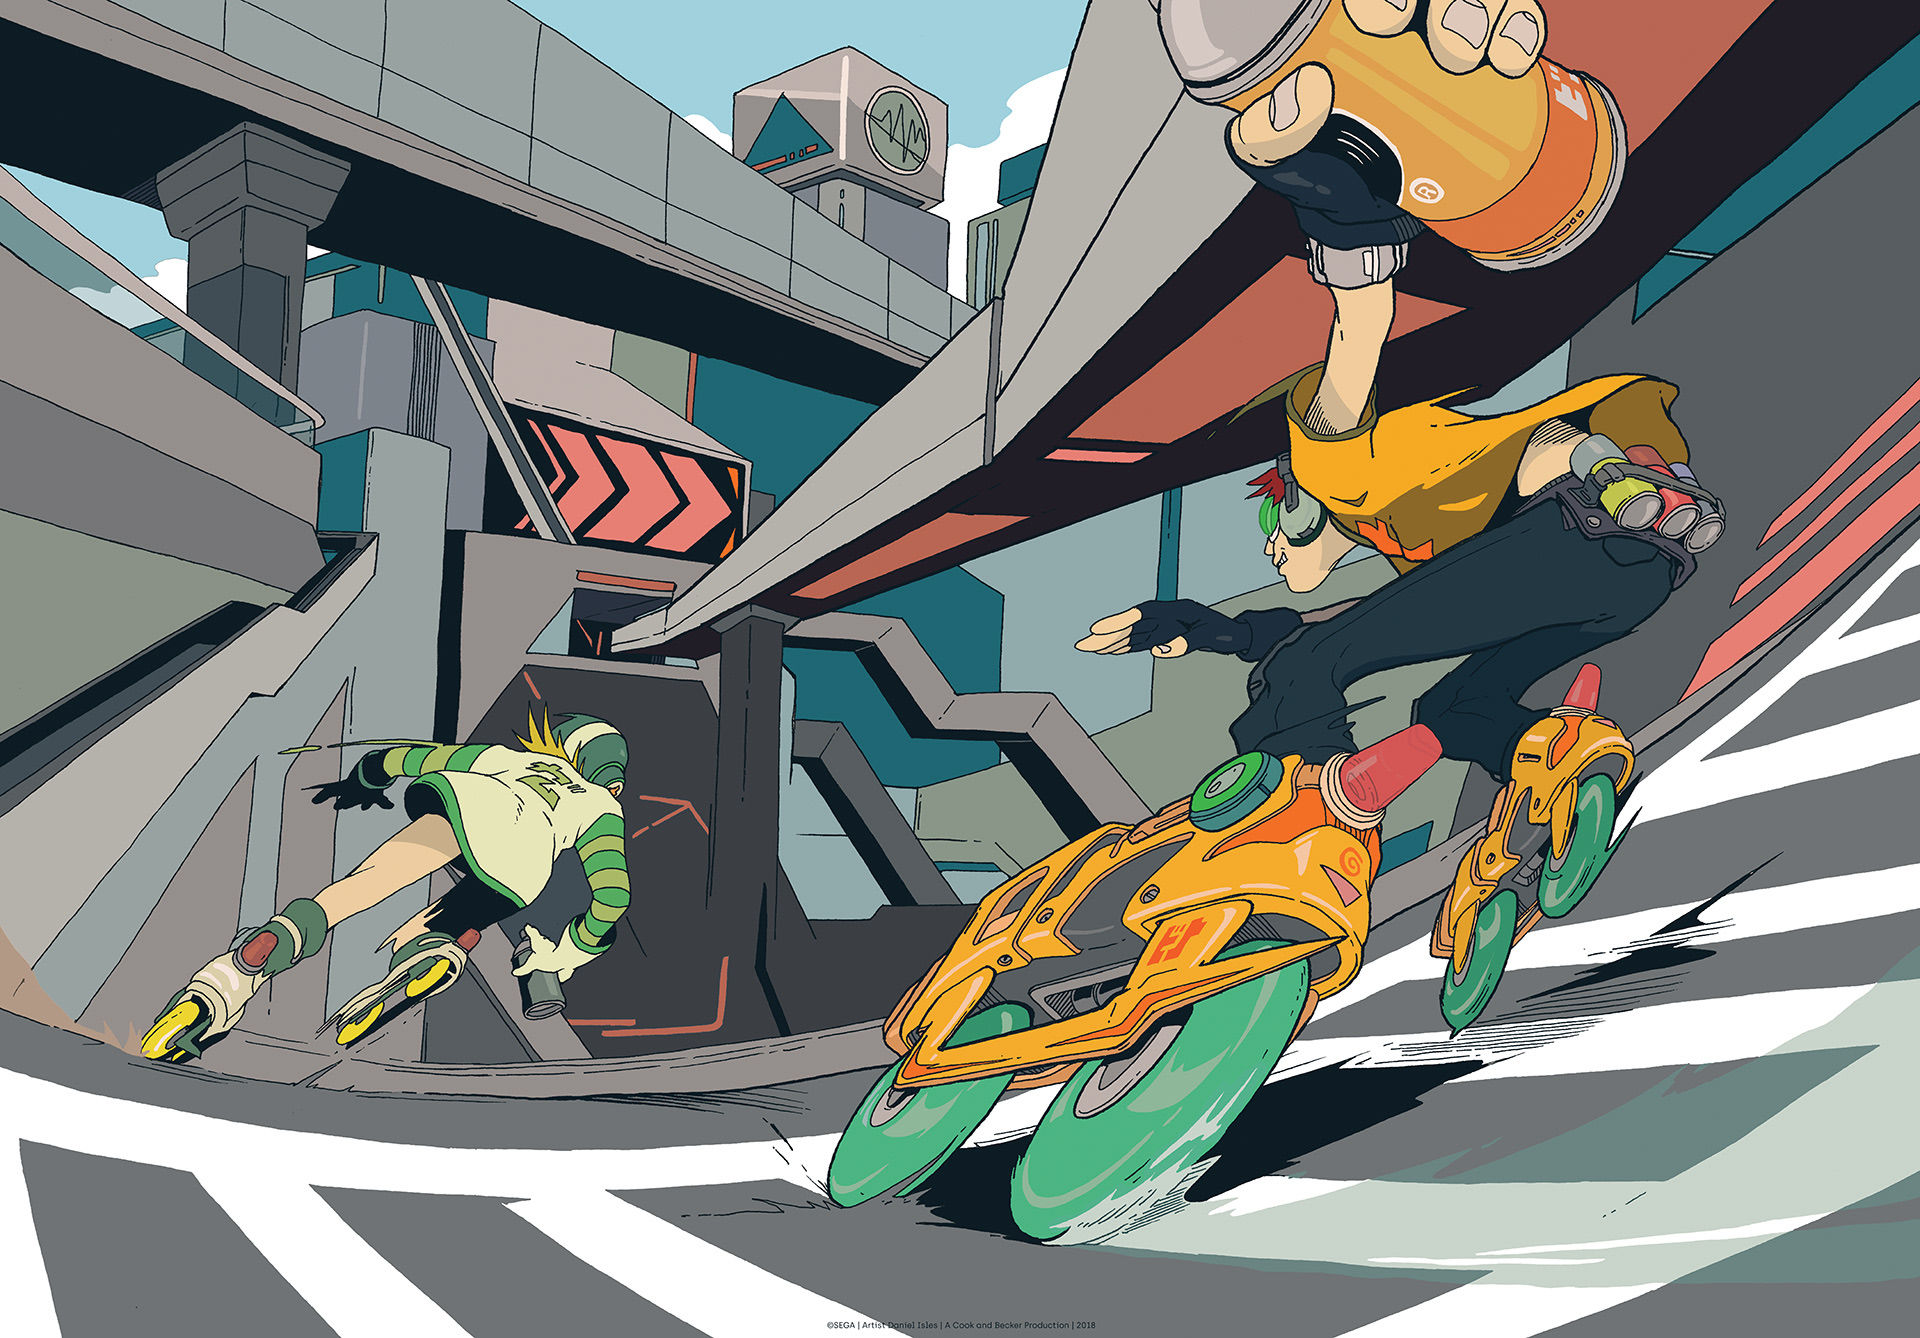 Jet Set Radio (2018) by 'DirtyRobot' Q&A